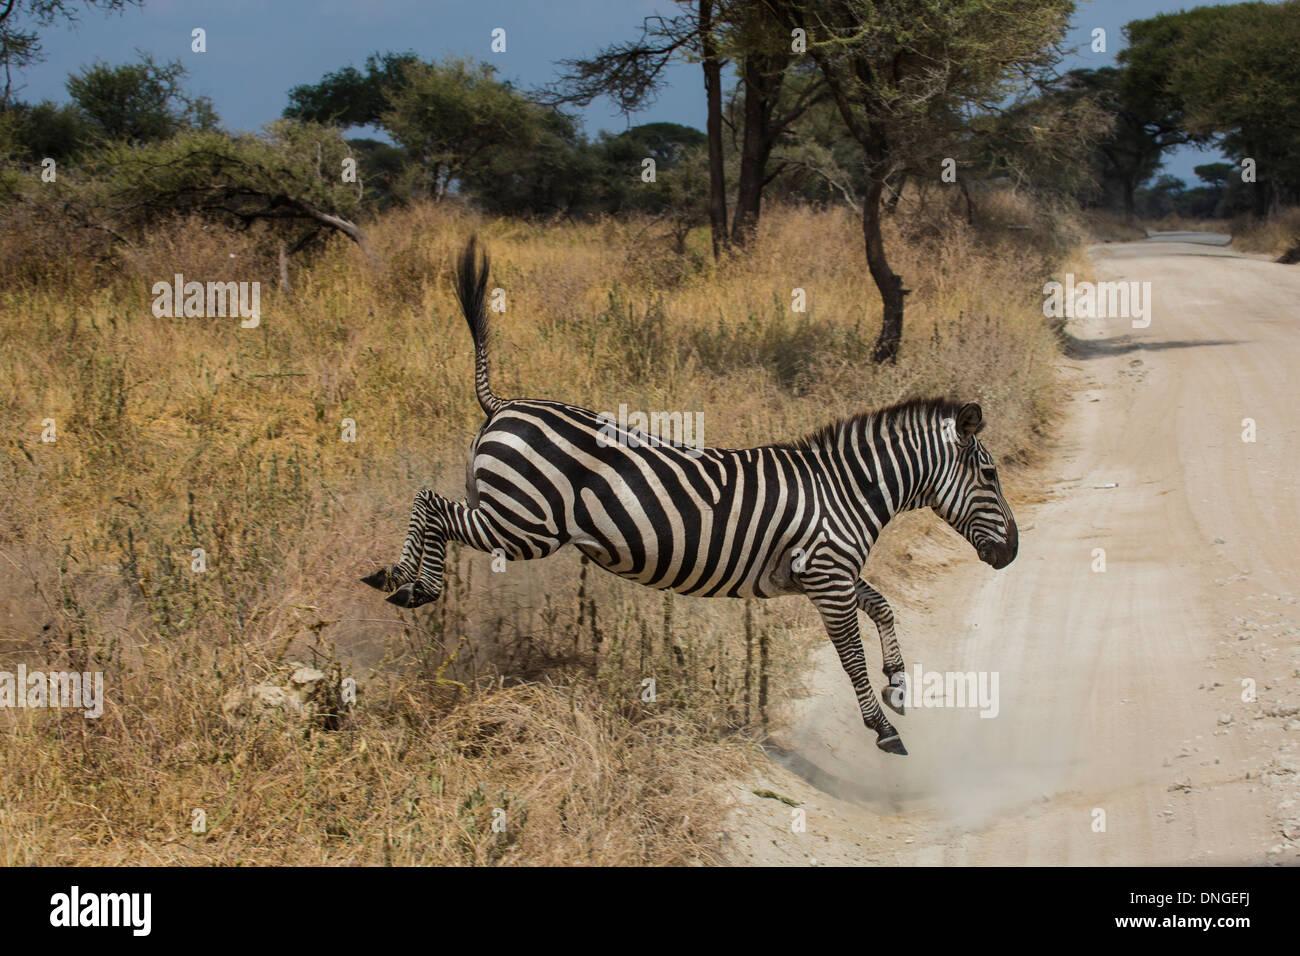 Zebras in Tarangire National Park, Tanzania - Stock Image